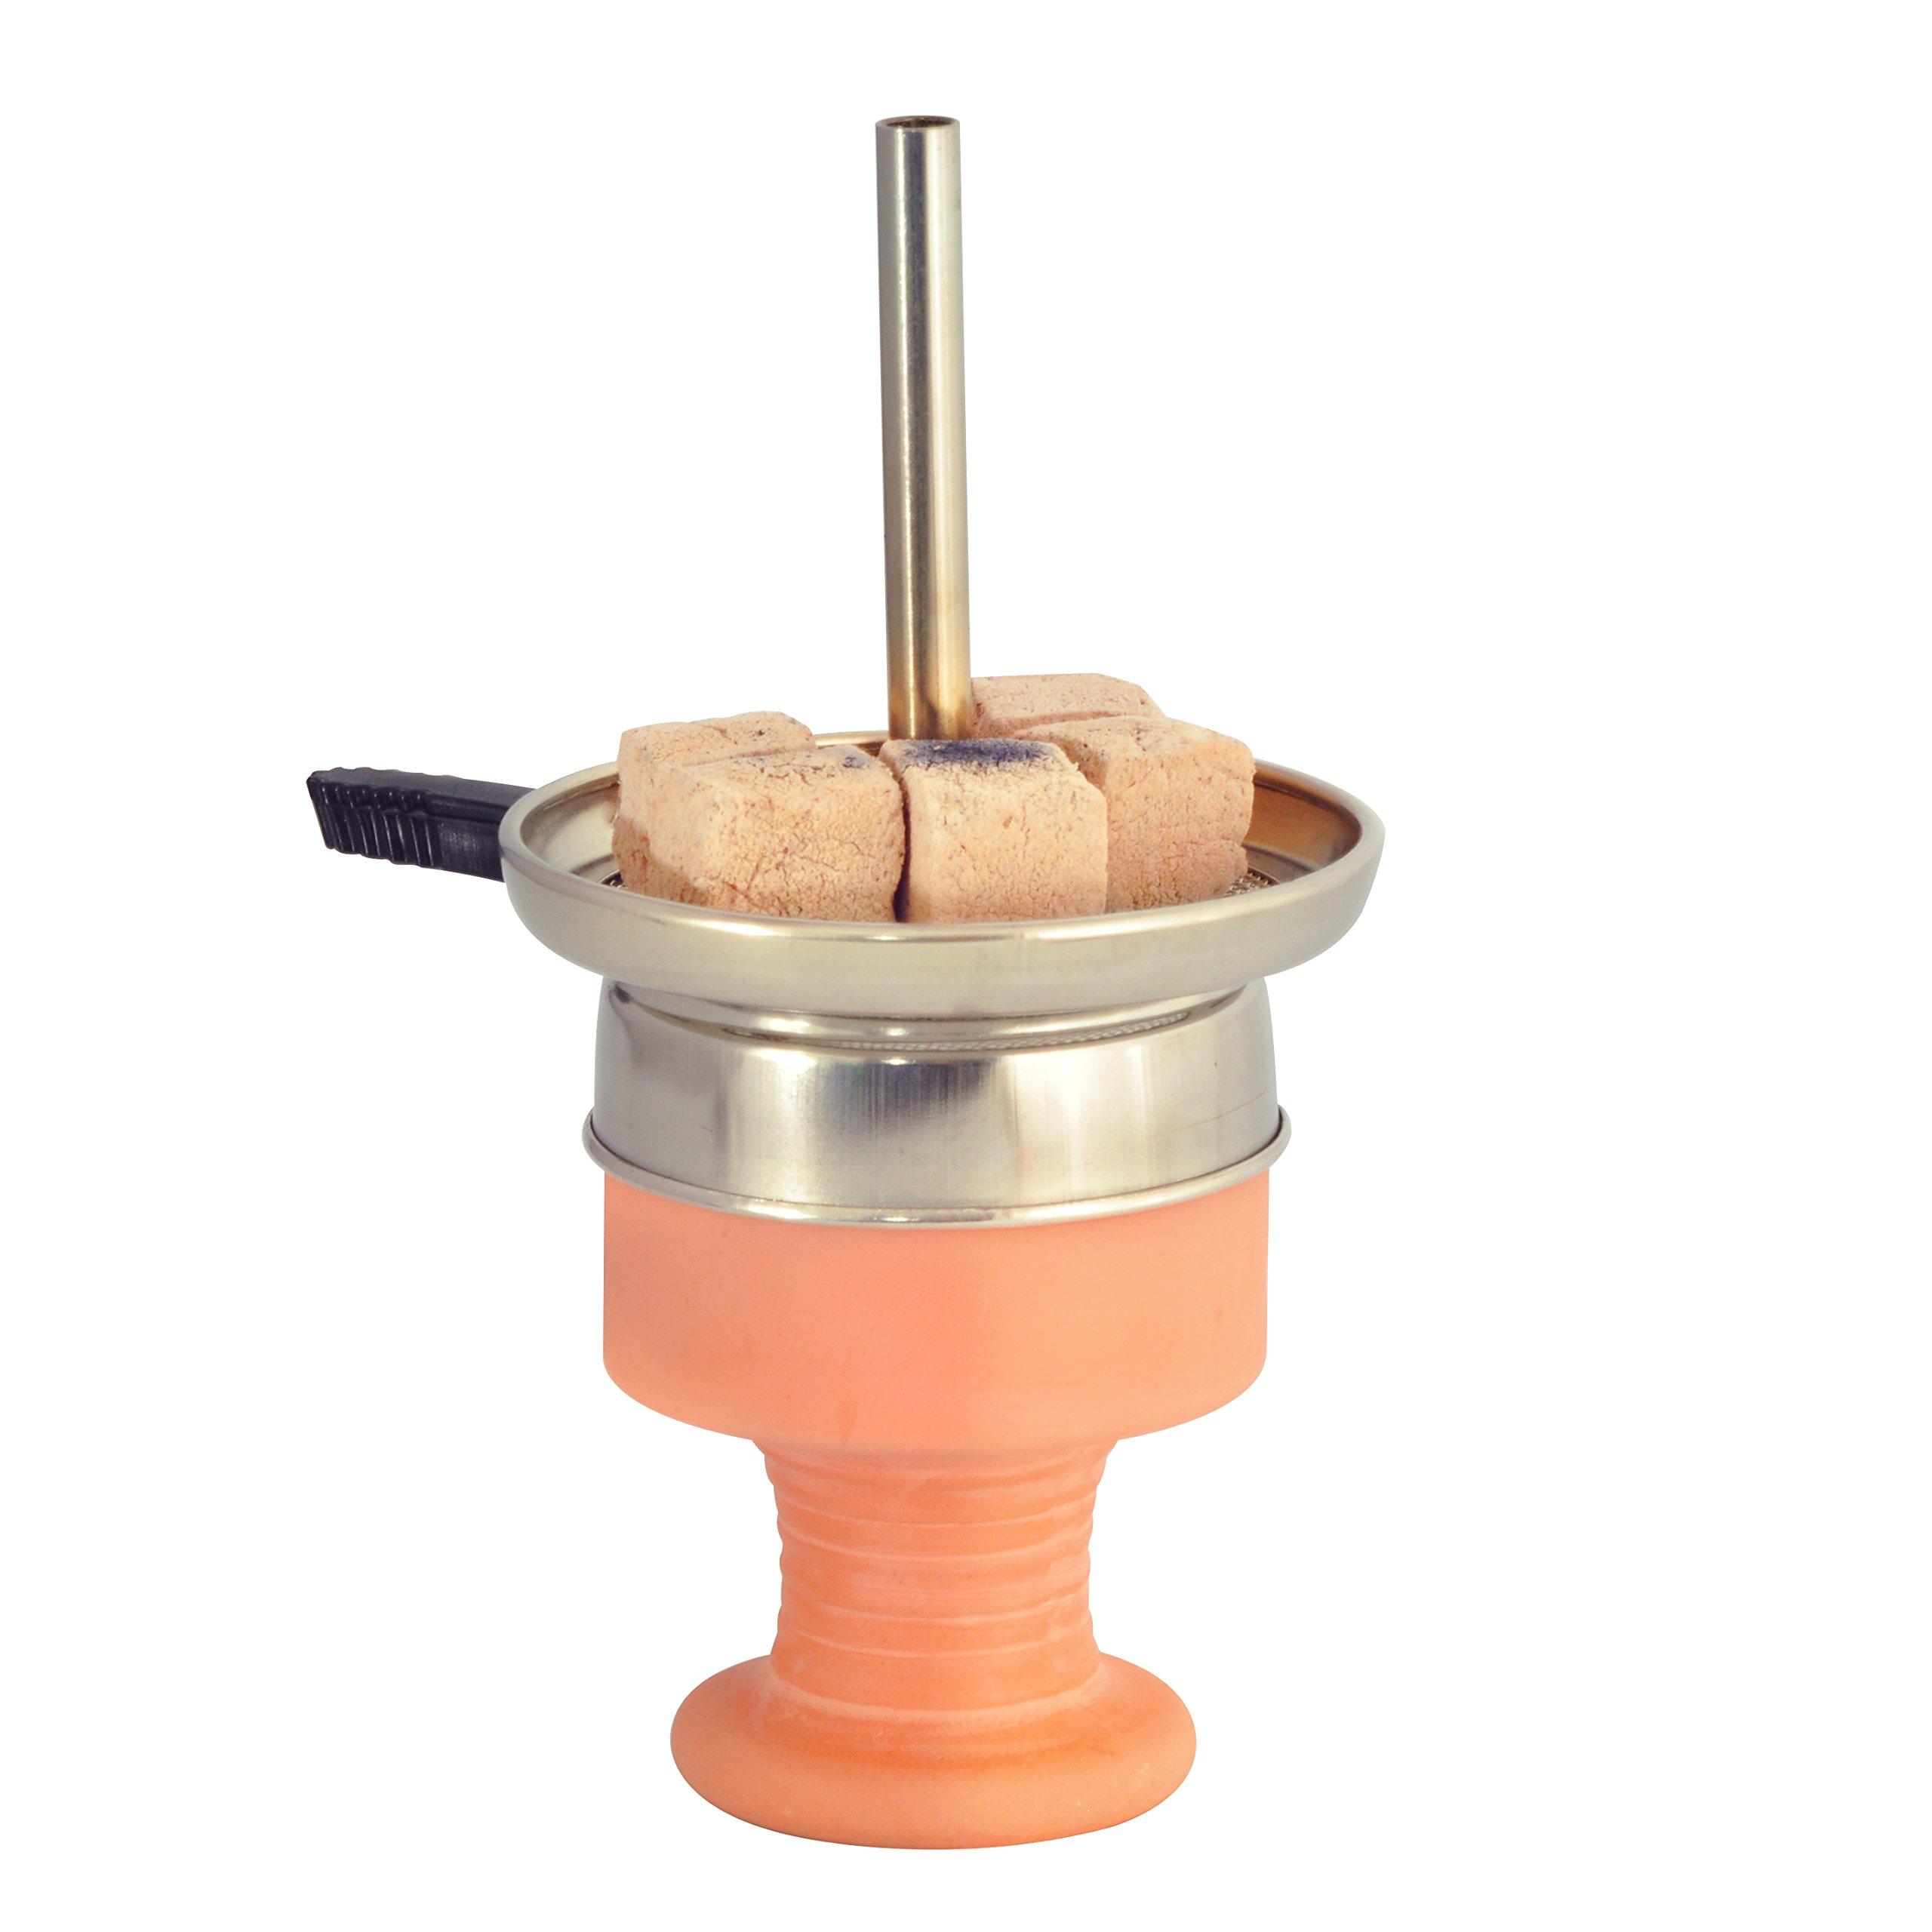 Kitosun Hookah Bowl Set Ceramic Hookah Bowl with 12 Holes Large Charcoal Holder Shisha Heat Management Bundle